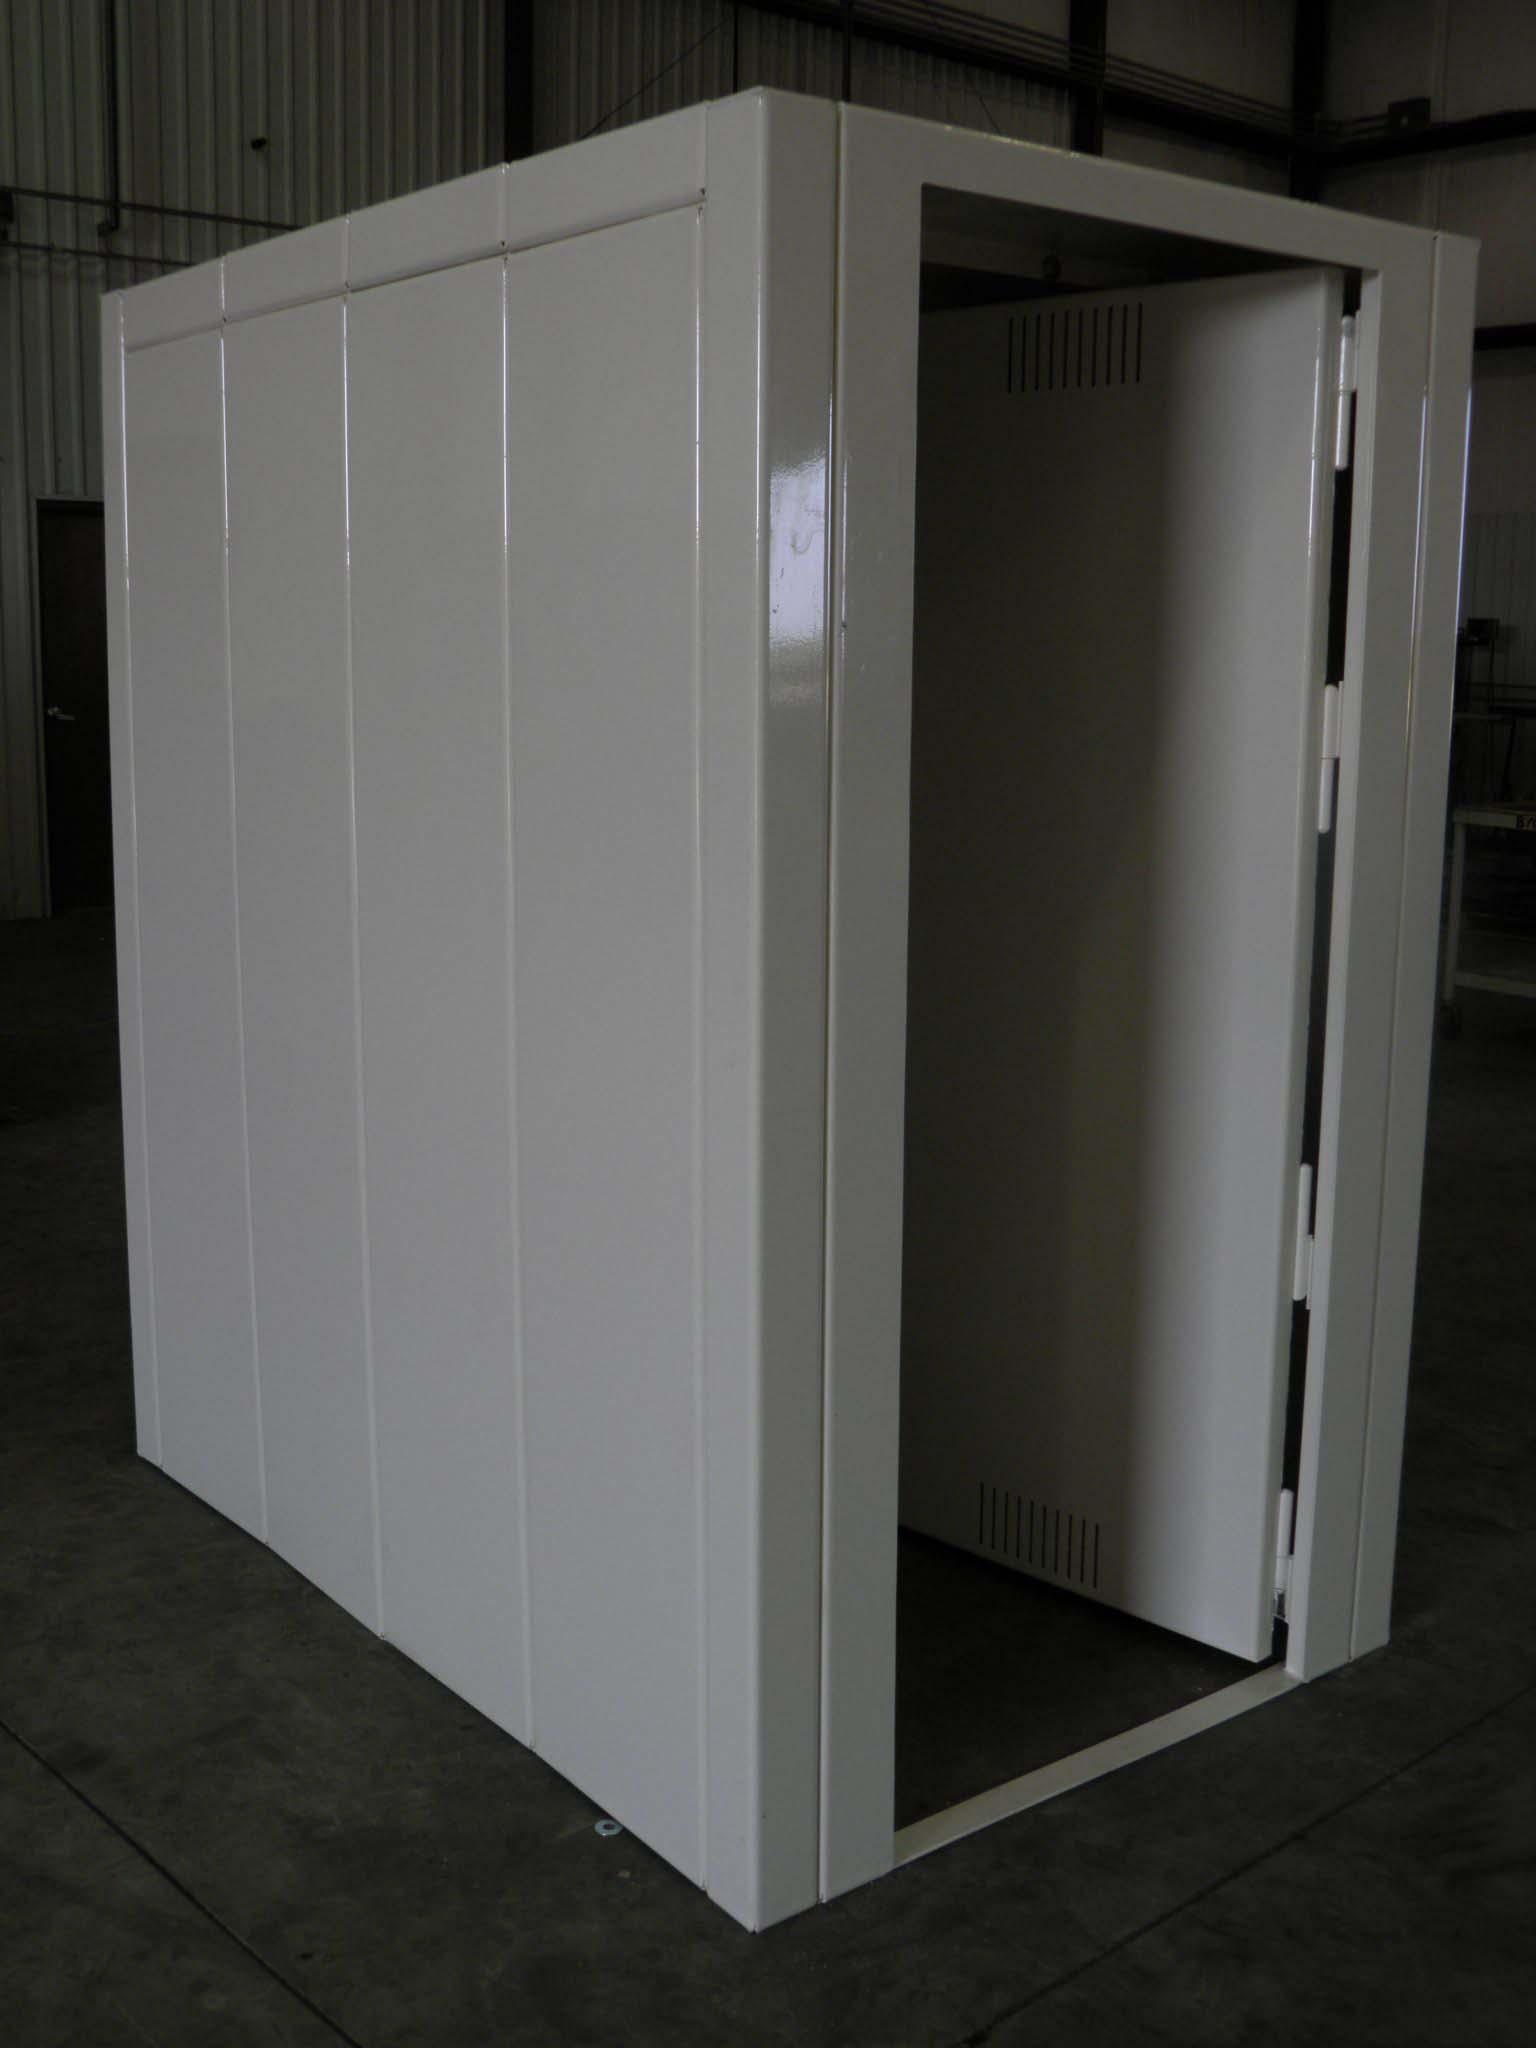 Storm shelter and safe room